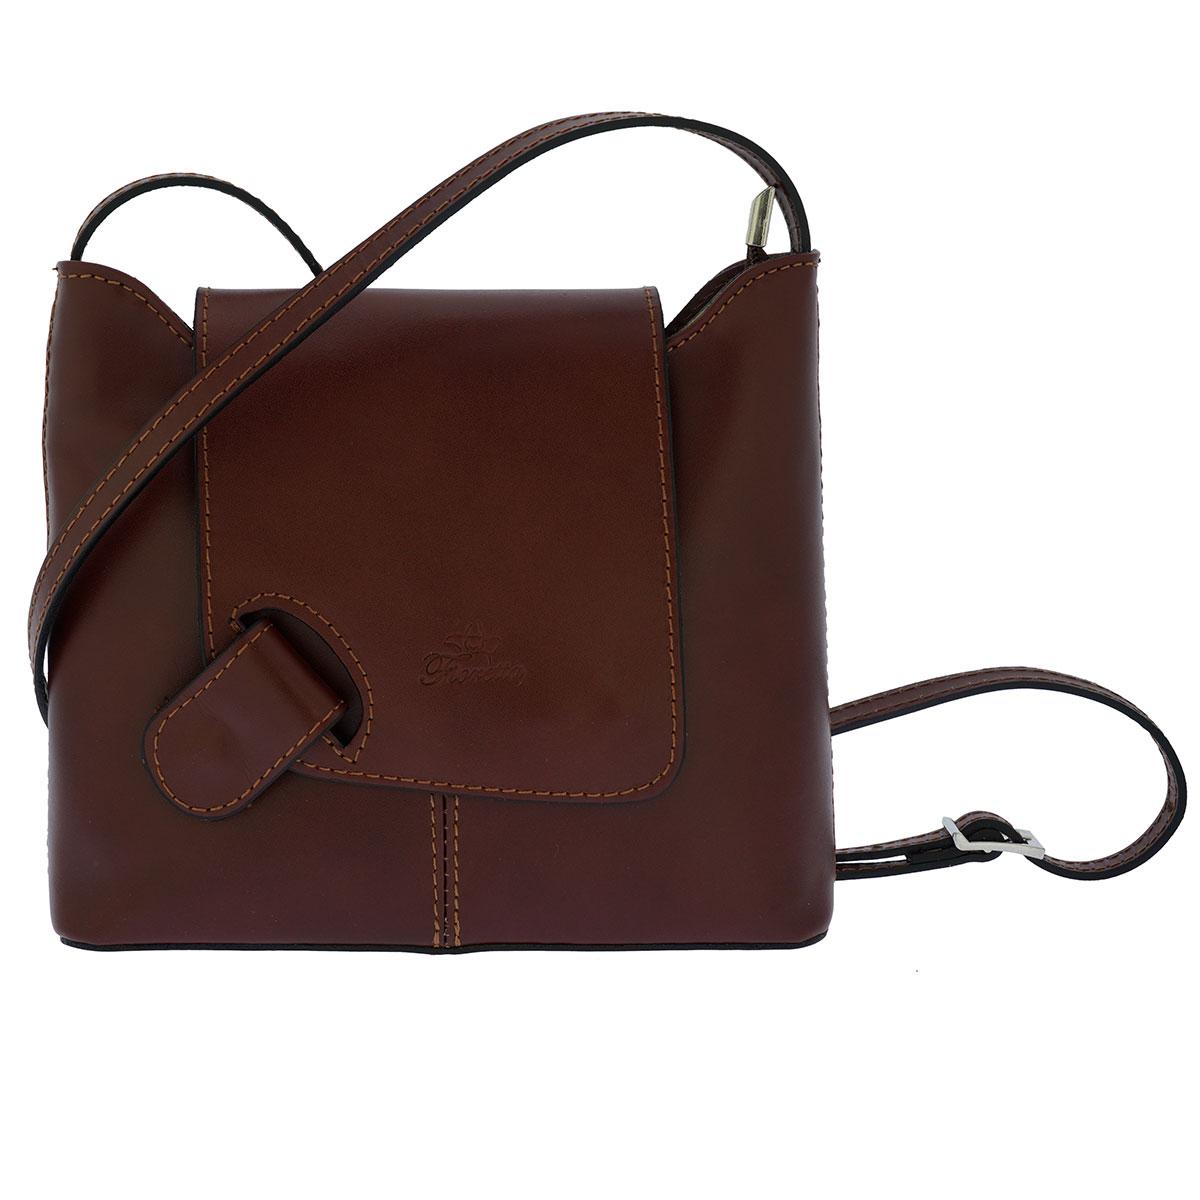 Fioretta Italian Genuine Leather Crossbody Shoulder Bag Handbag For Women - Brown